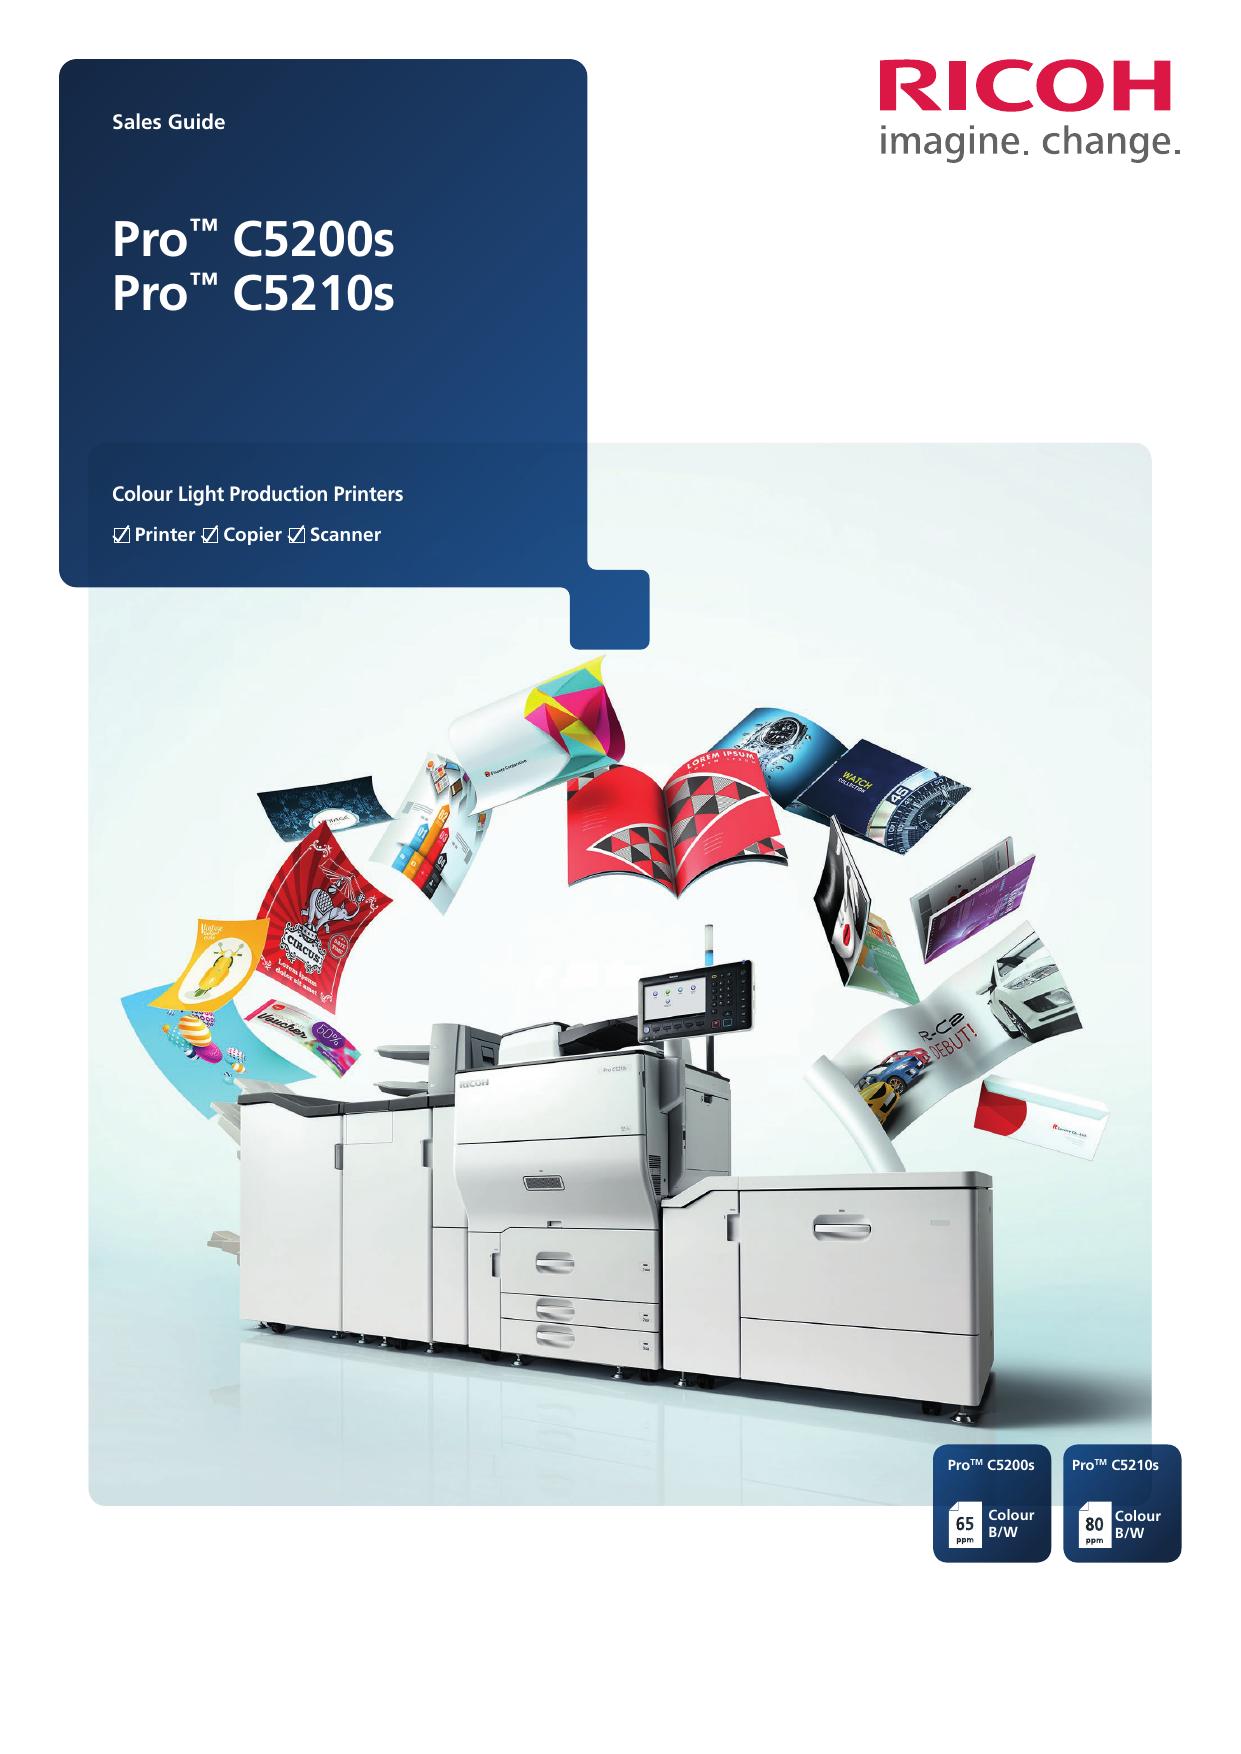 Pro™ C5200s Pro™ C5210s | manualzz com